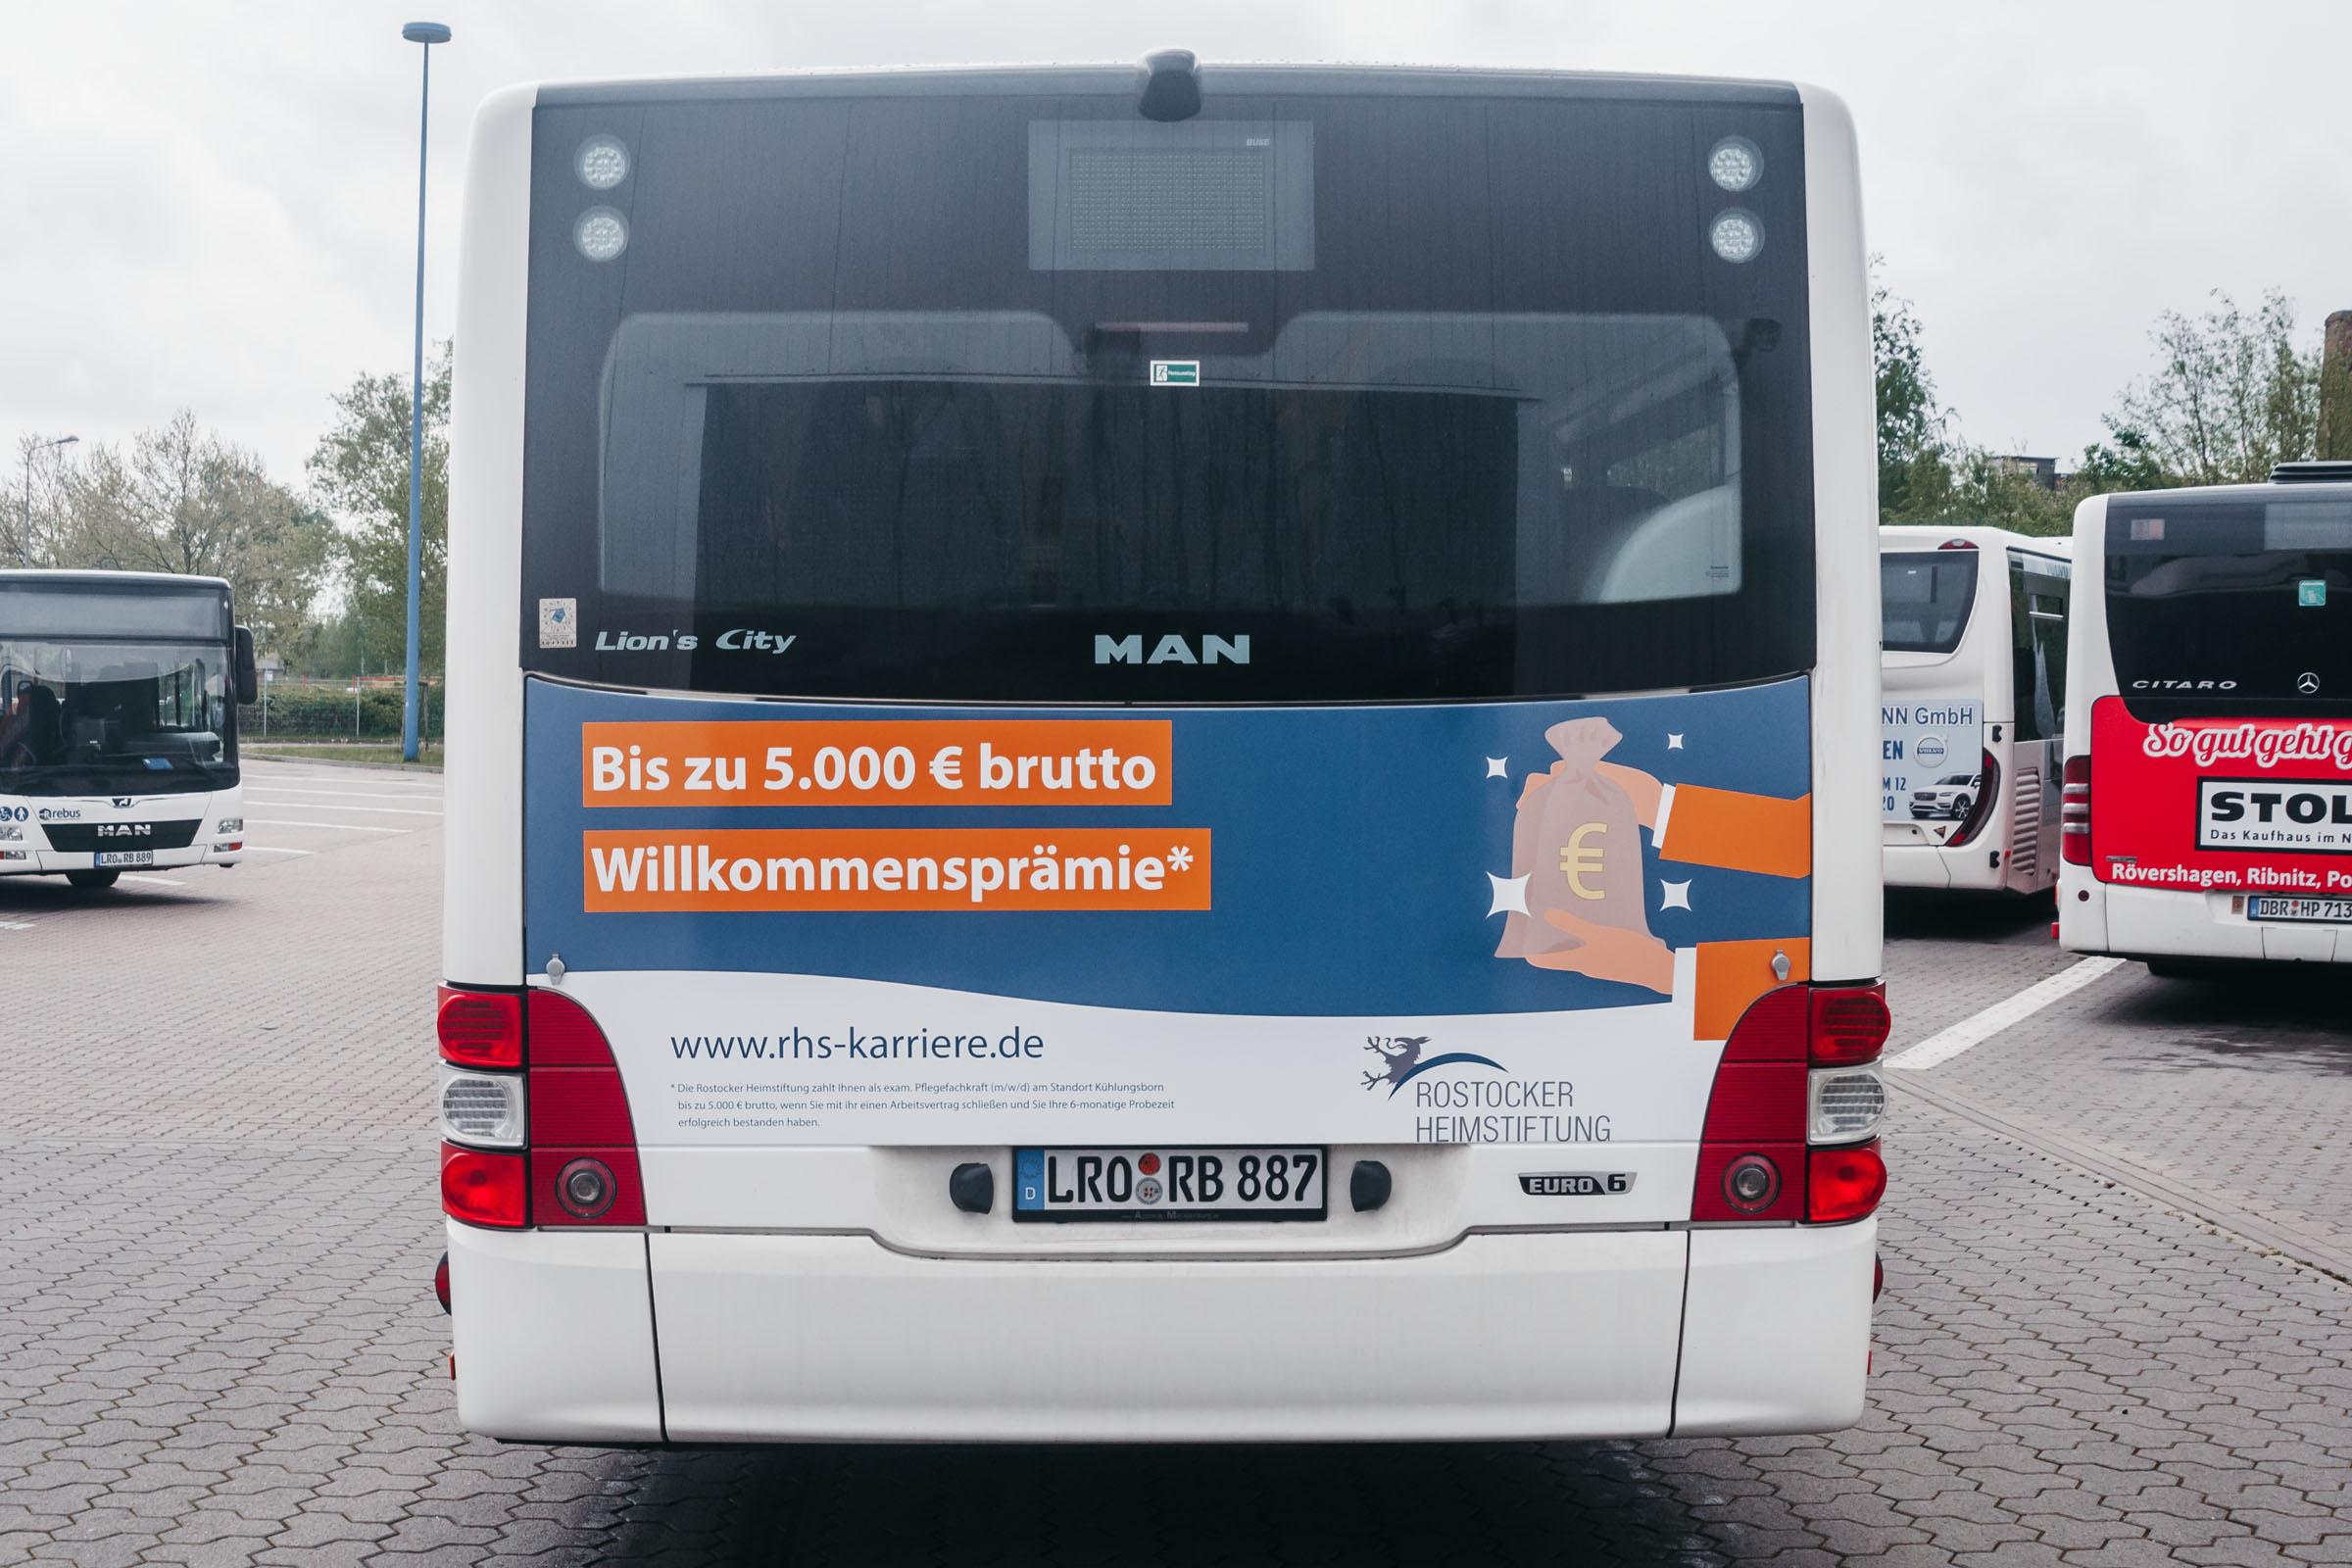 Bus Rostock Kühlungsborn